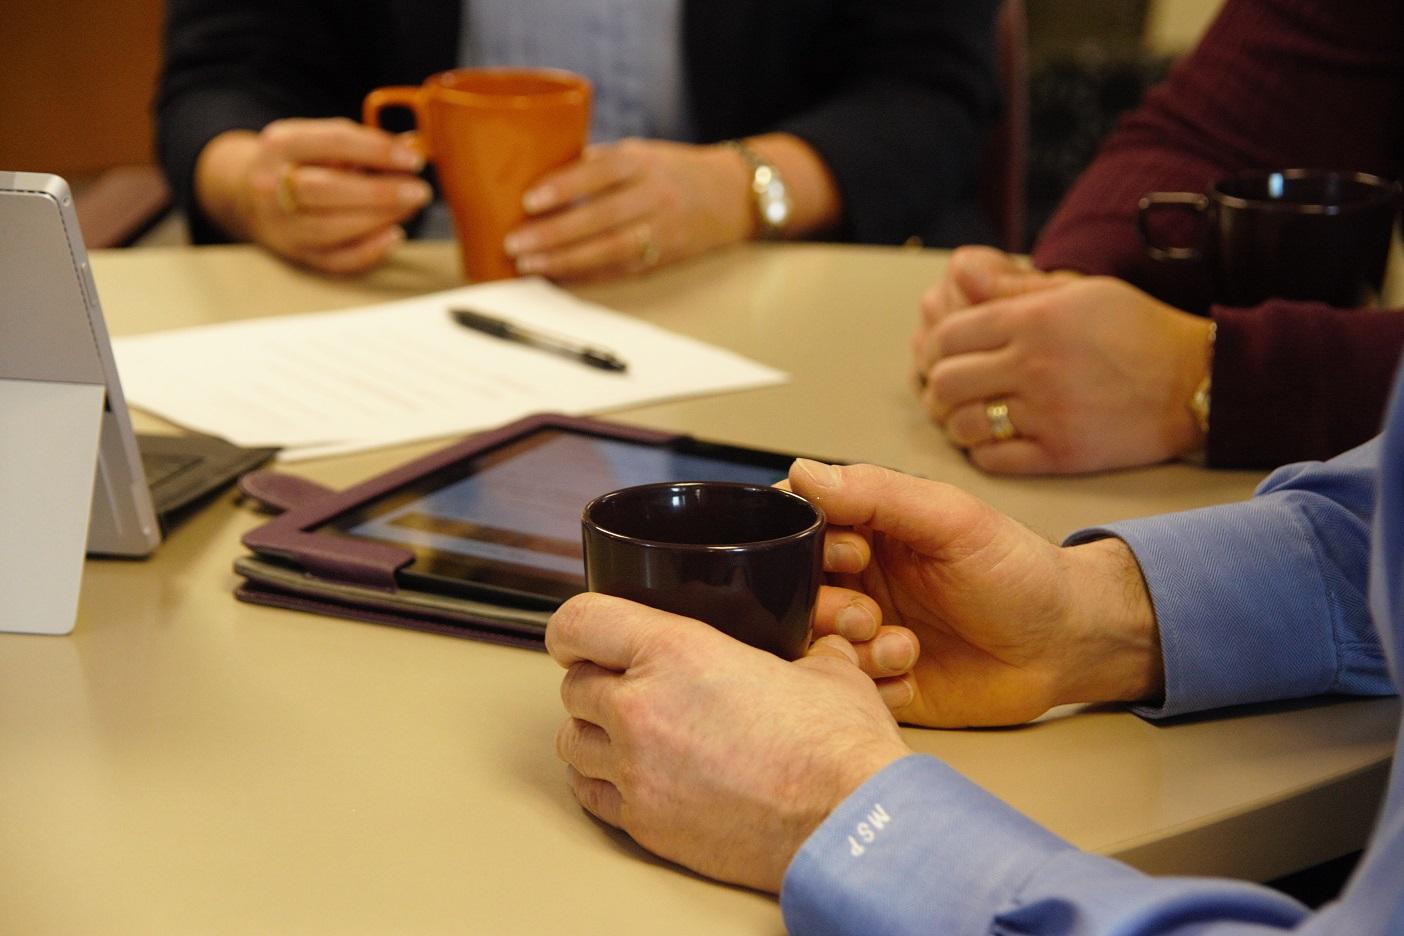 wip dashboard meeting with coffee